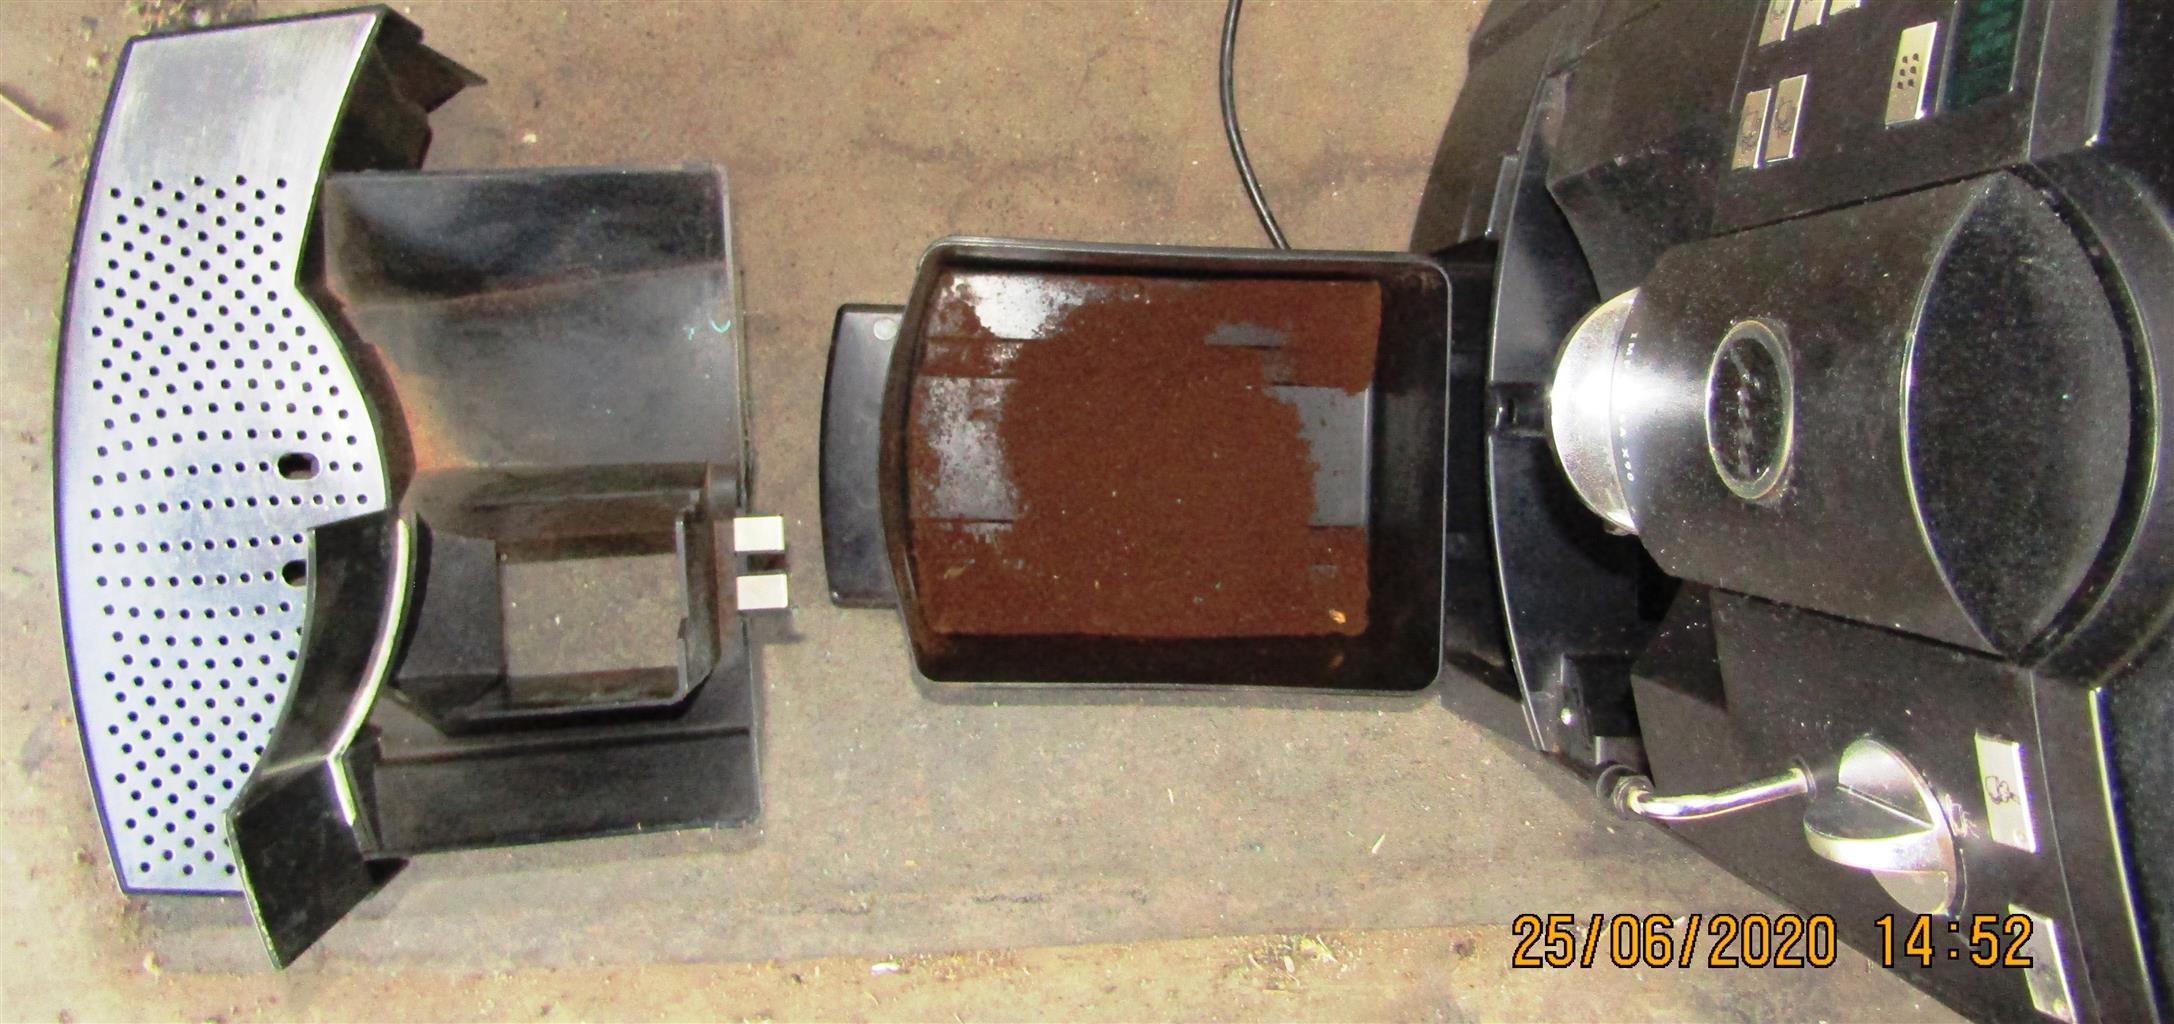 Jura Impressa X90 Fully Automated Coffee Machine